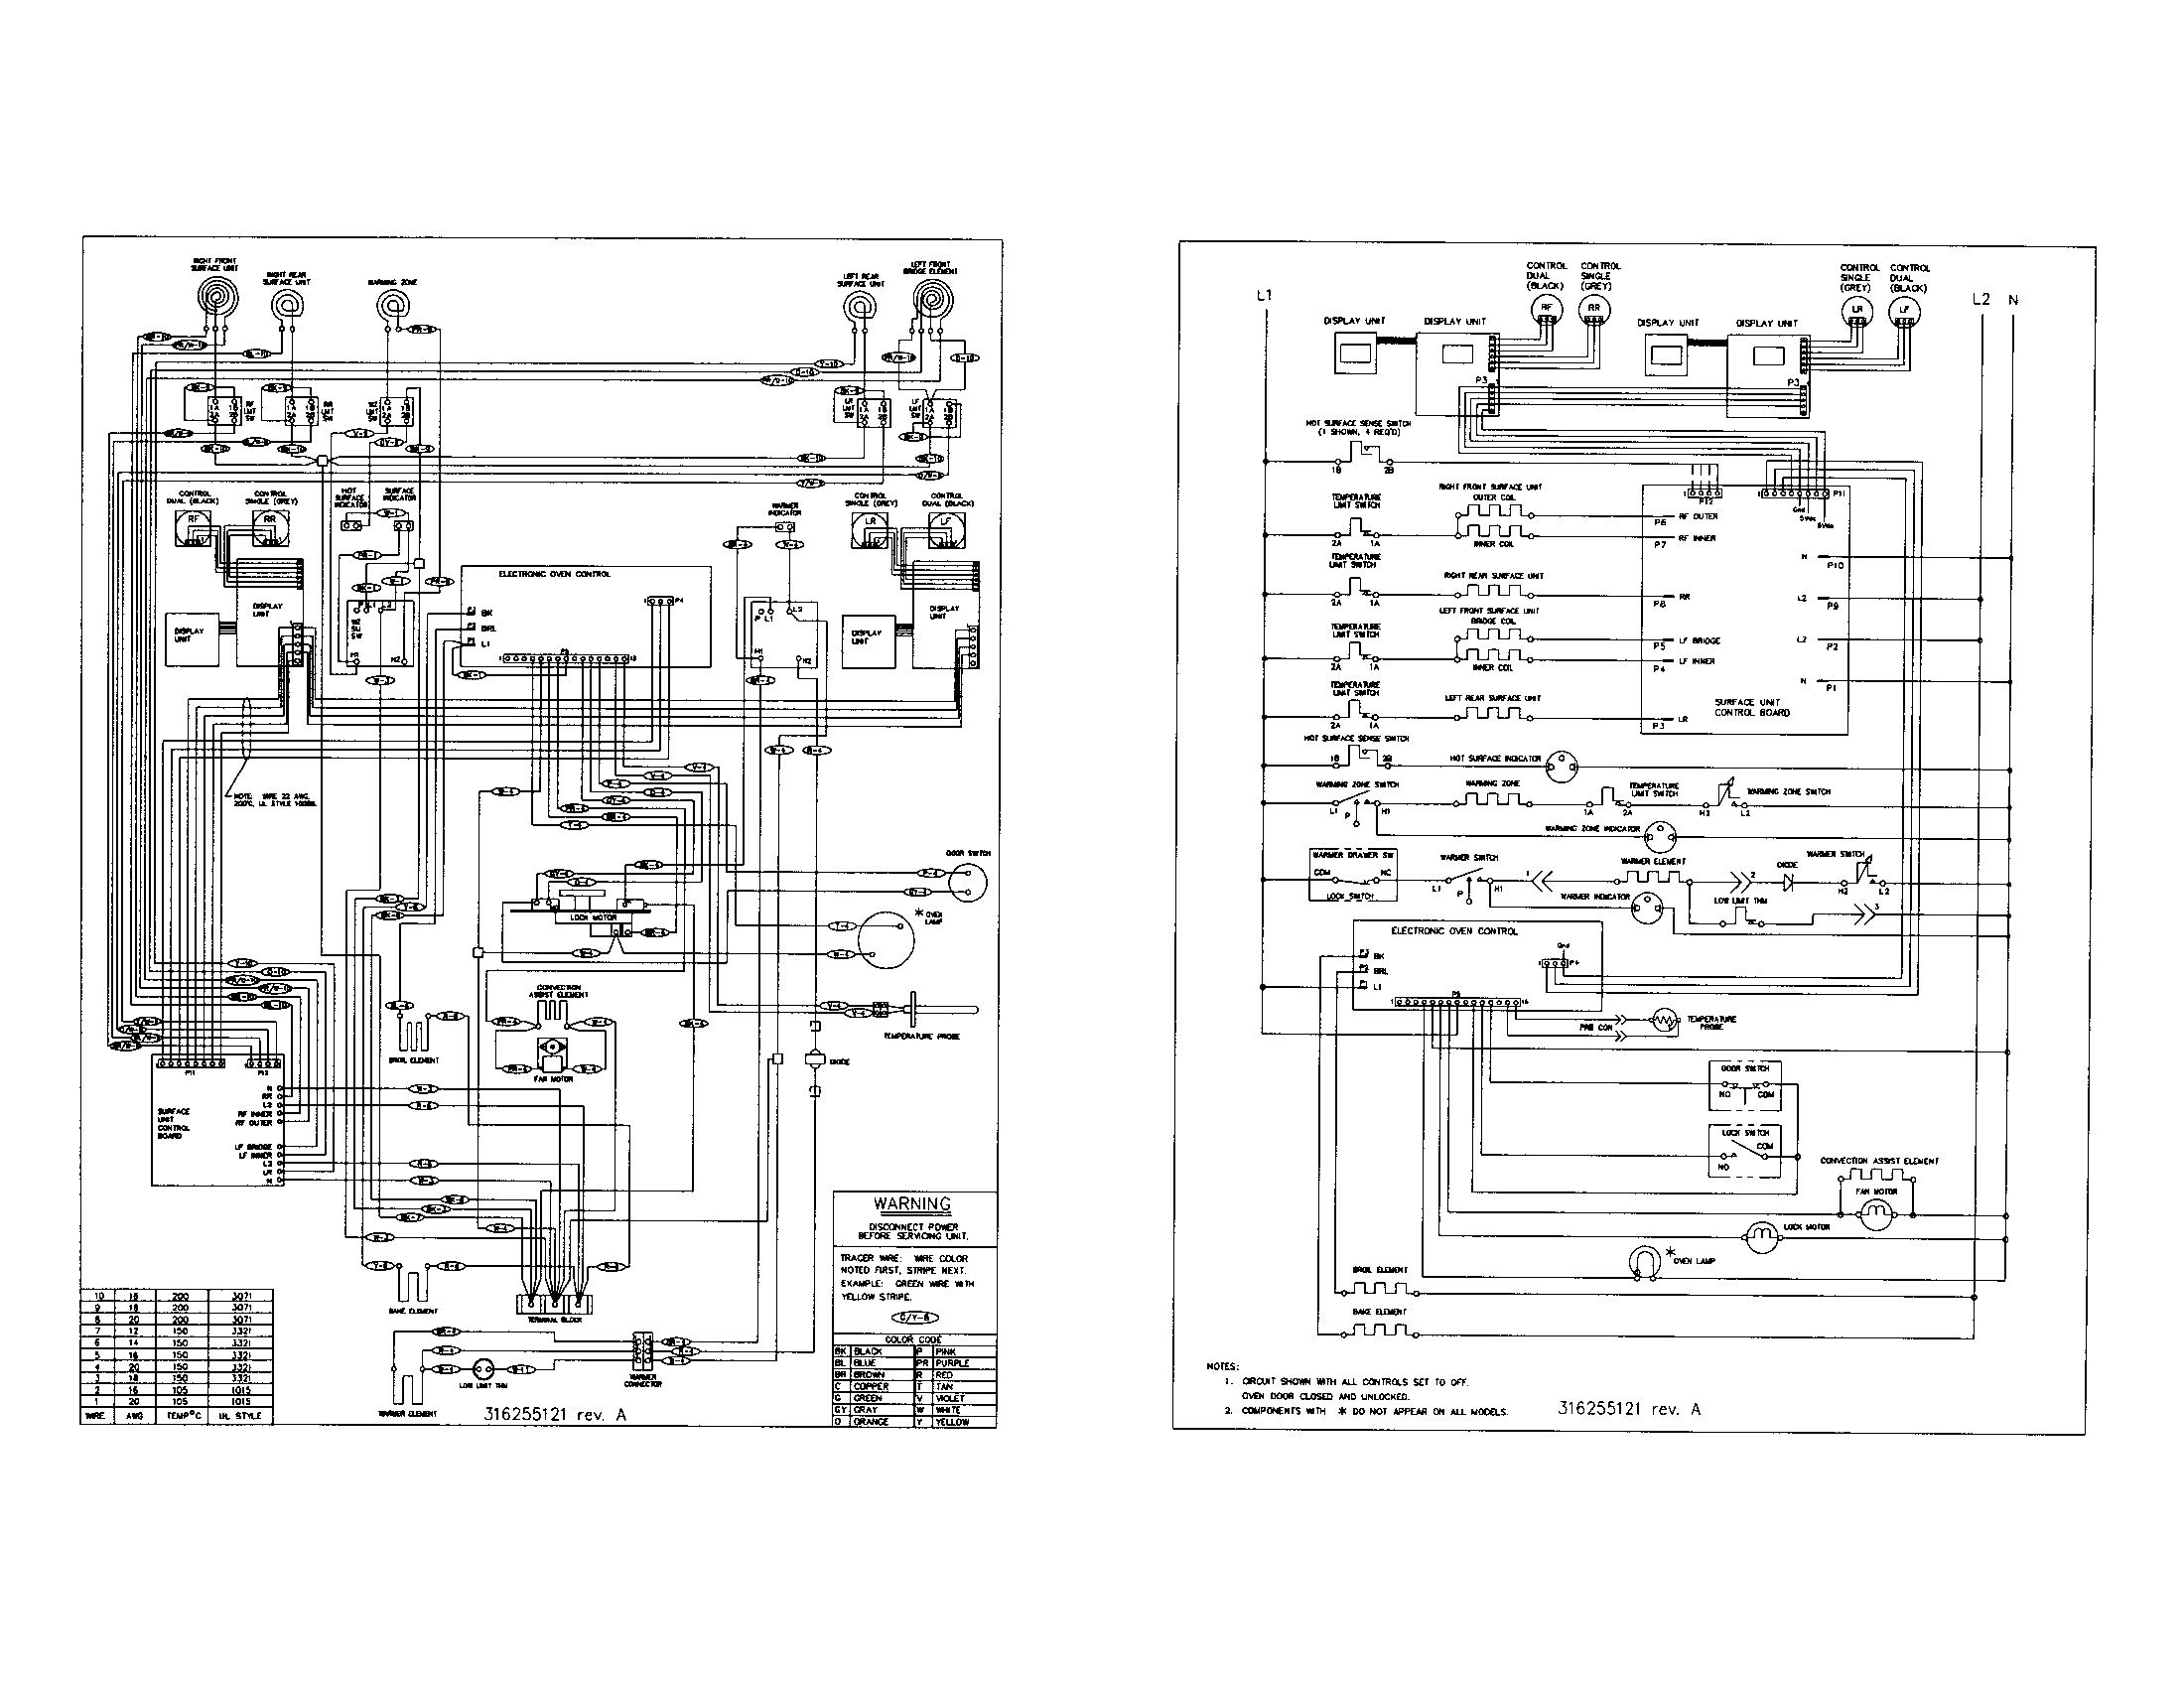 Ge Gas Furnace Wiring Diagram   Wiring Diagram Ge Furnace Wiring Diagram on ge gas furnace manual, ge furnace model numbers, gas furnace diagram, ge air conditioner diagram, ge refrigerator schematic diagram,